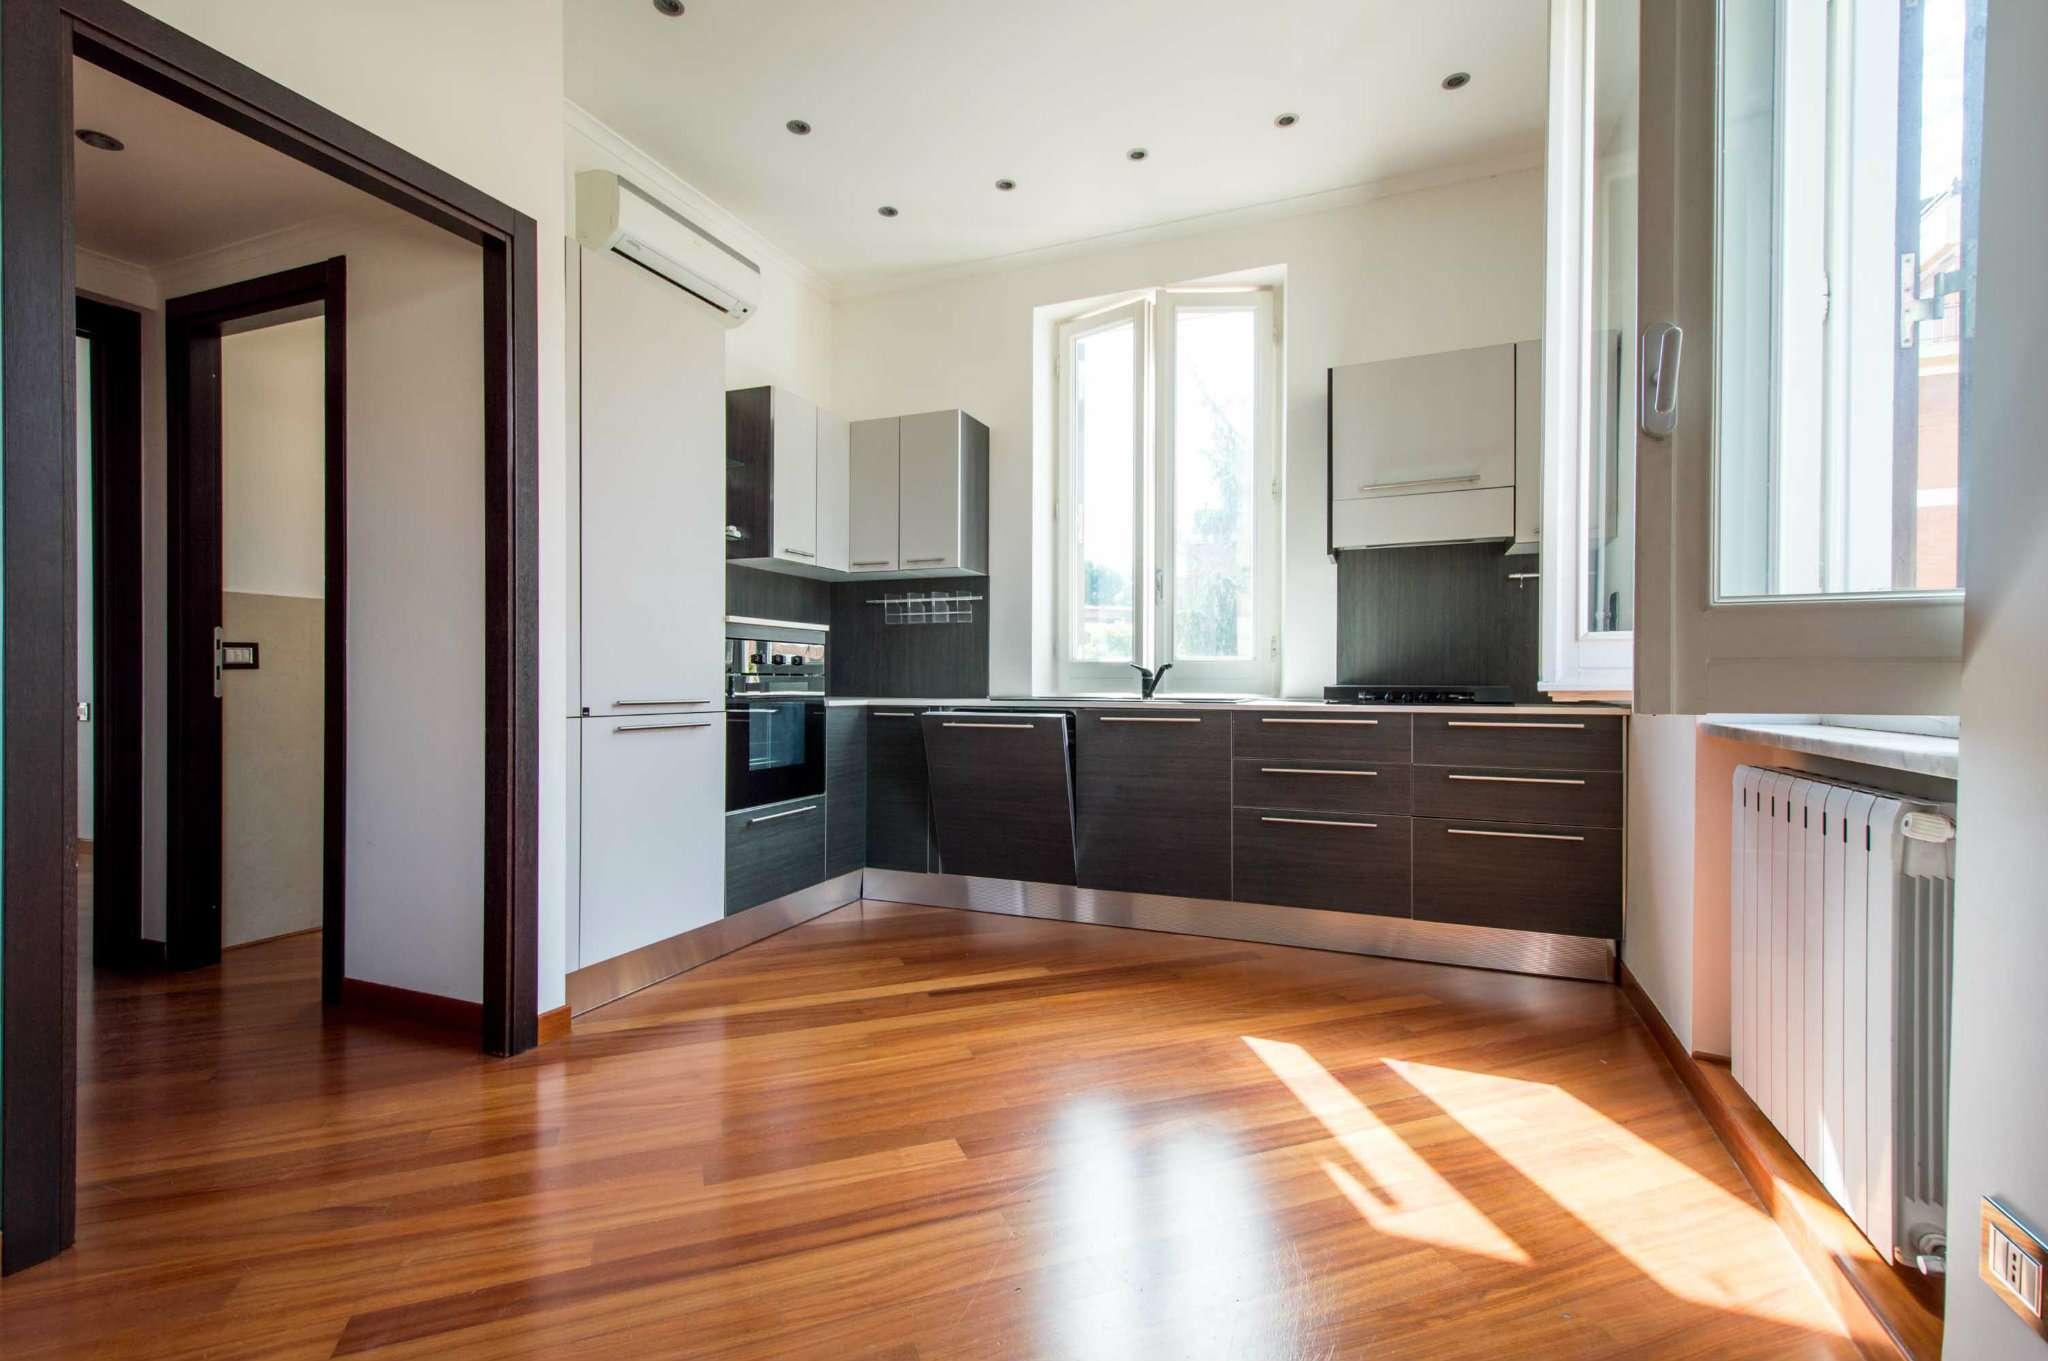 cucina a vista